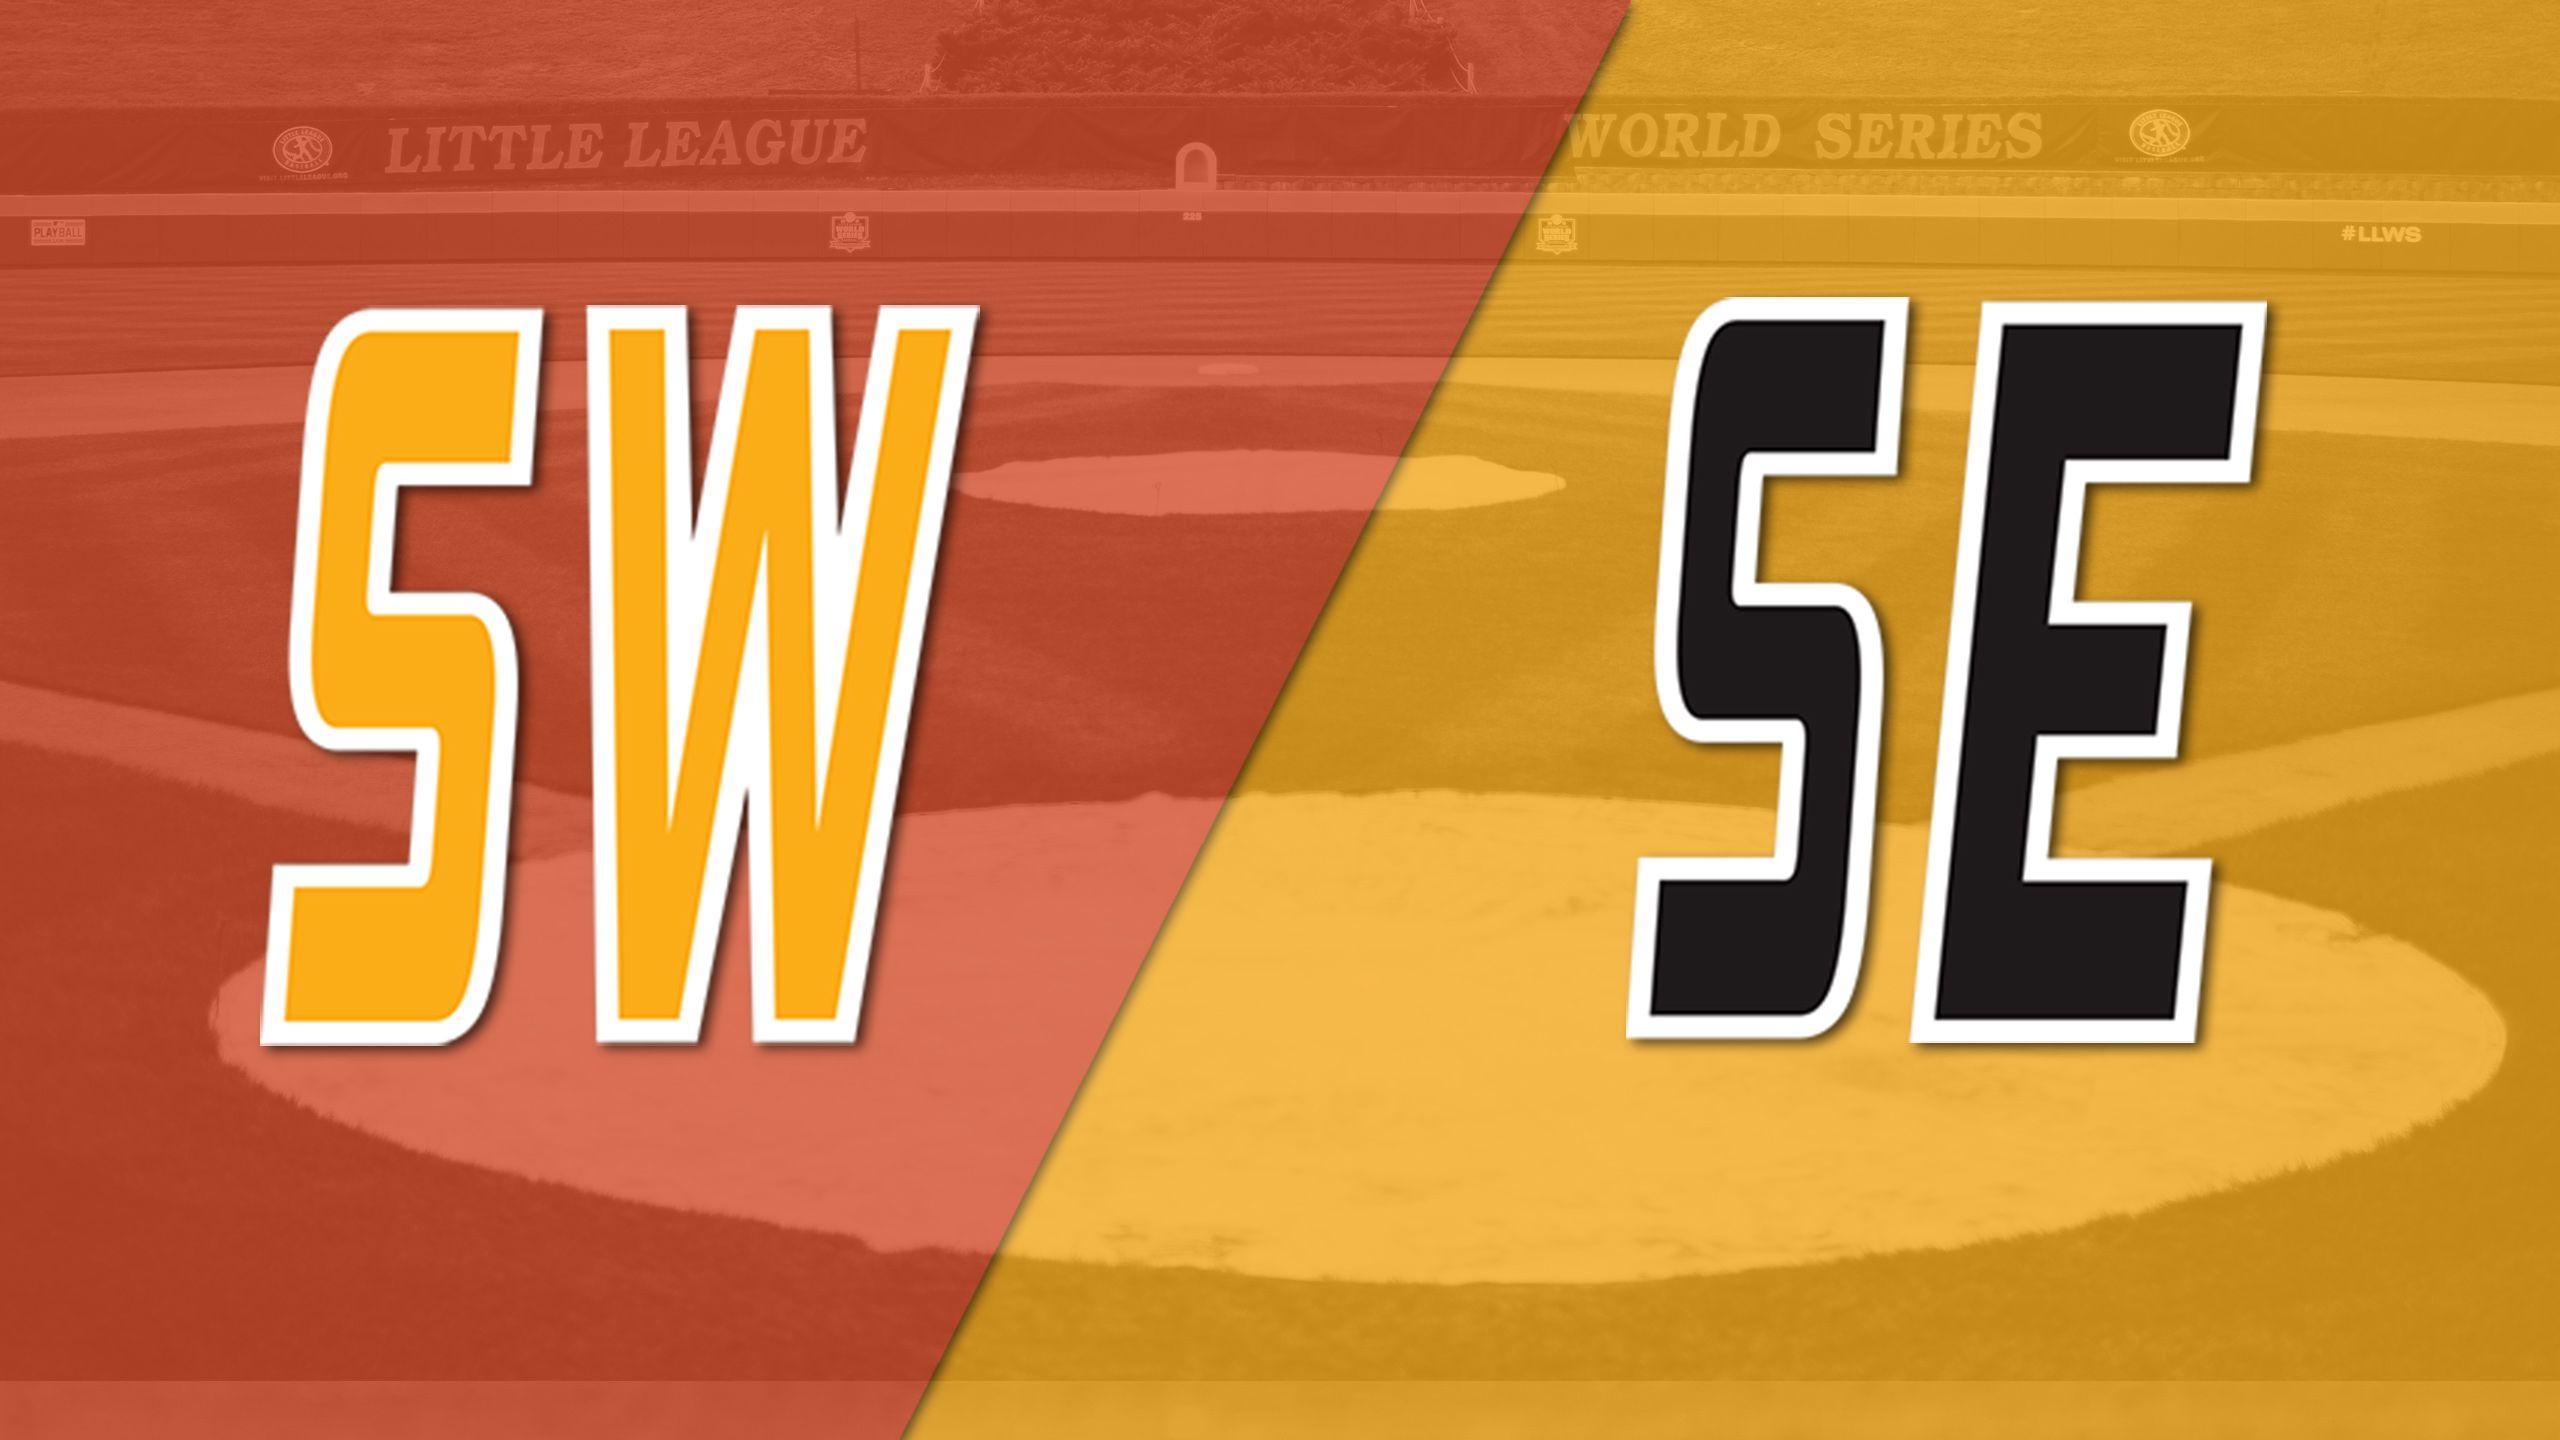 Lufkin, Texas vs. Greenville, North Carolina (U.S. Championship Game) (Little League World Series)